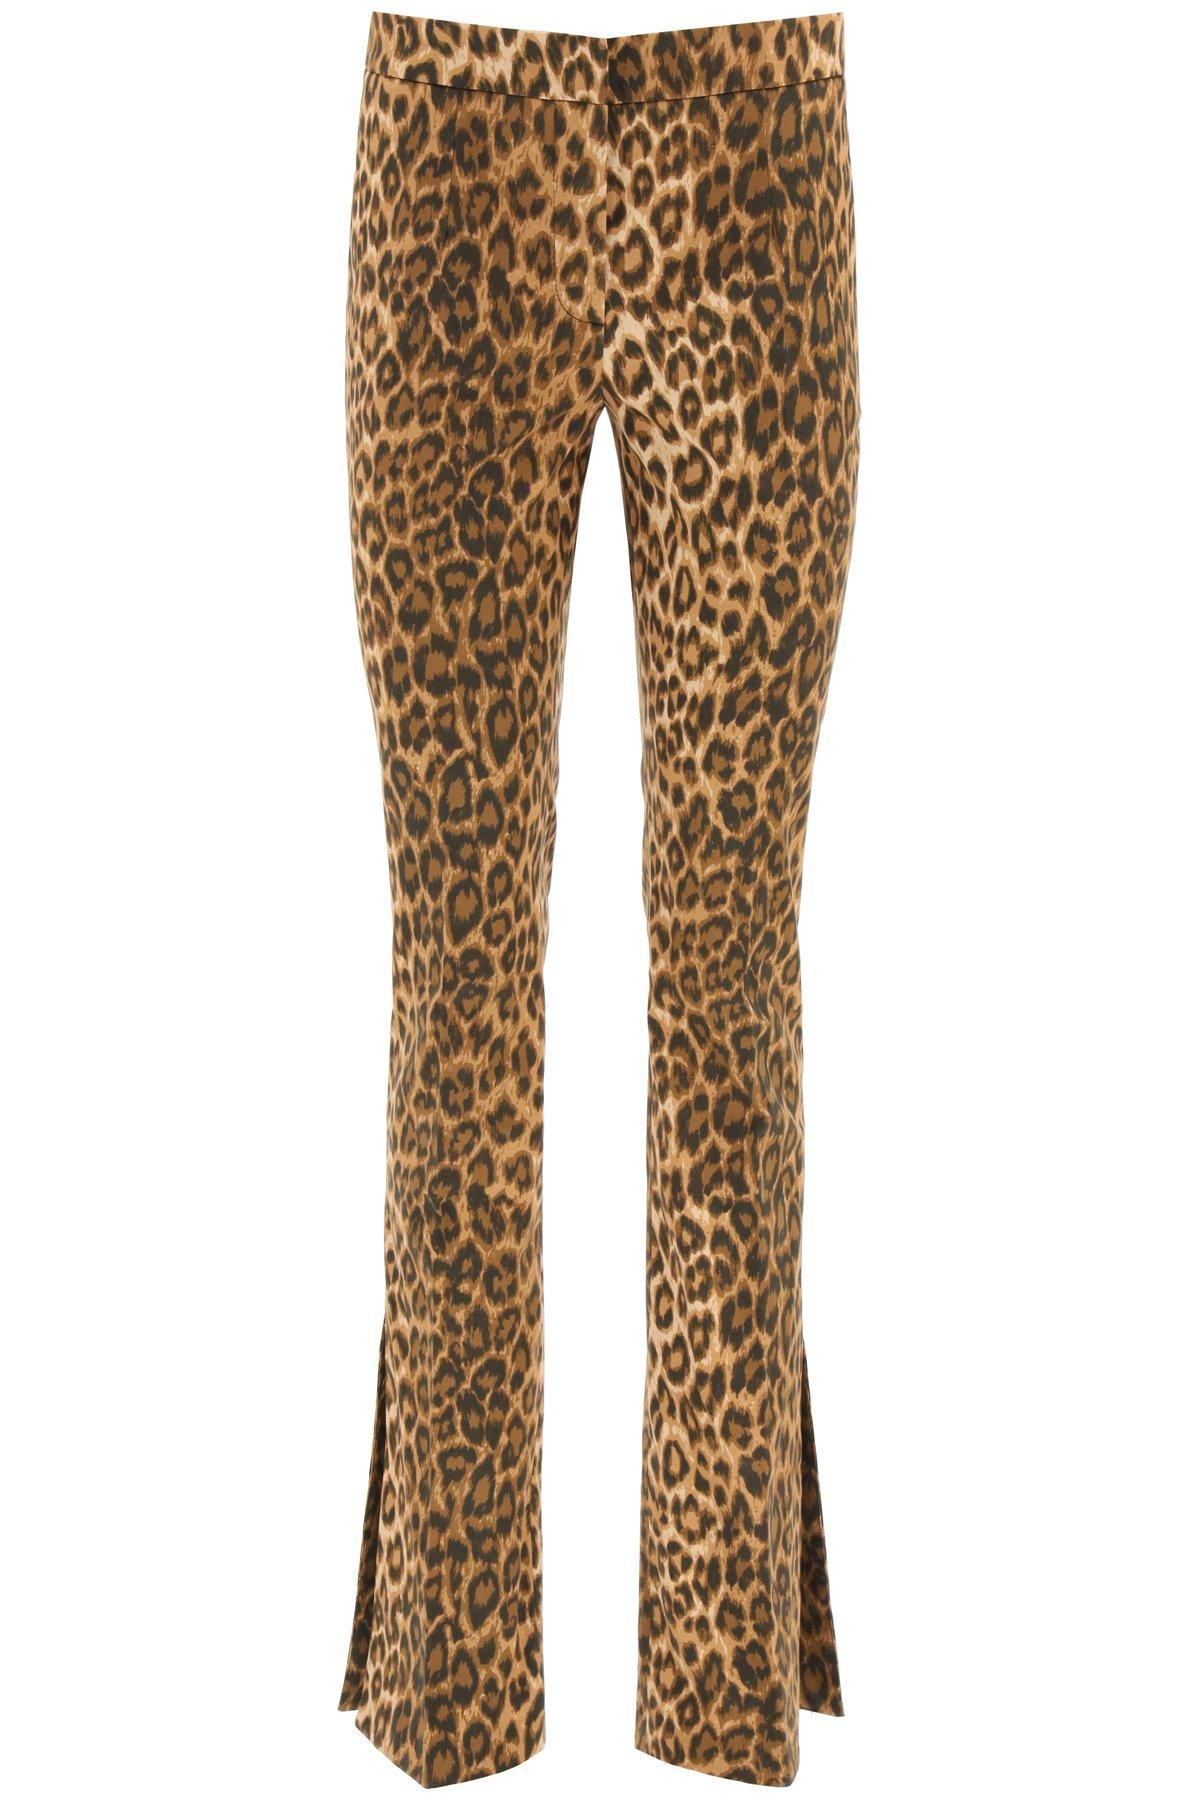 Blumarine pantaloni in cotone leopard